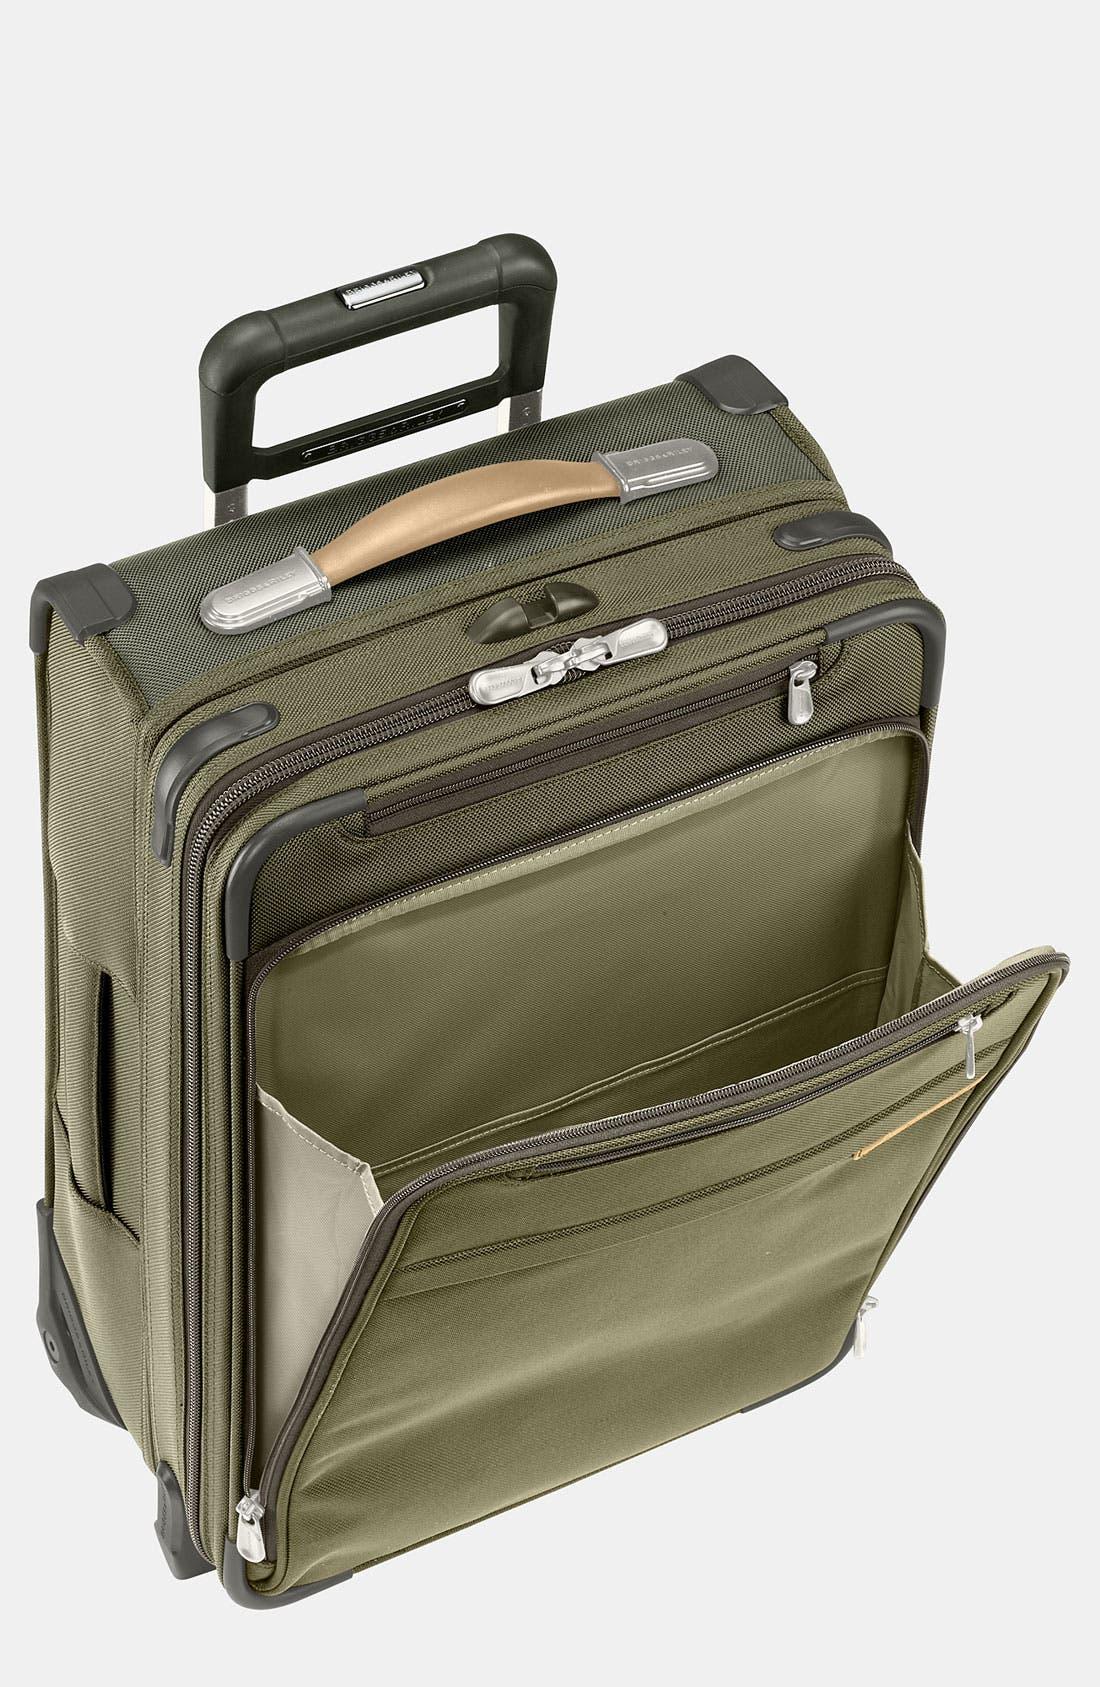 BRIGGS & RILEY Medium Baseline Expandable Packing Case